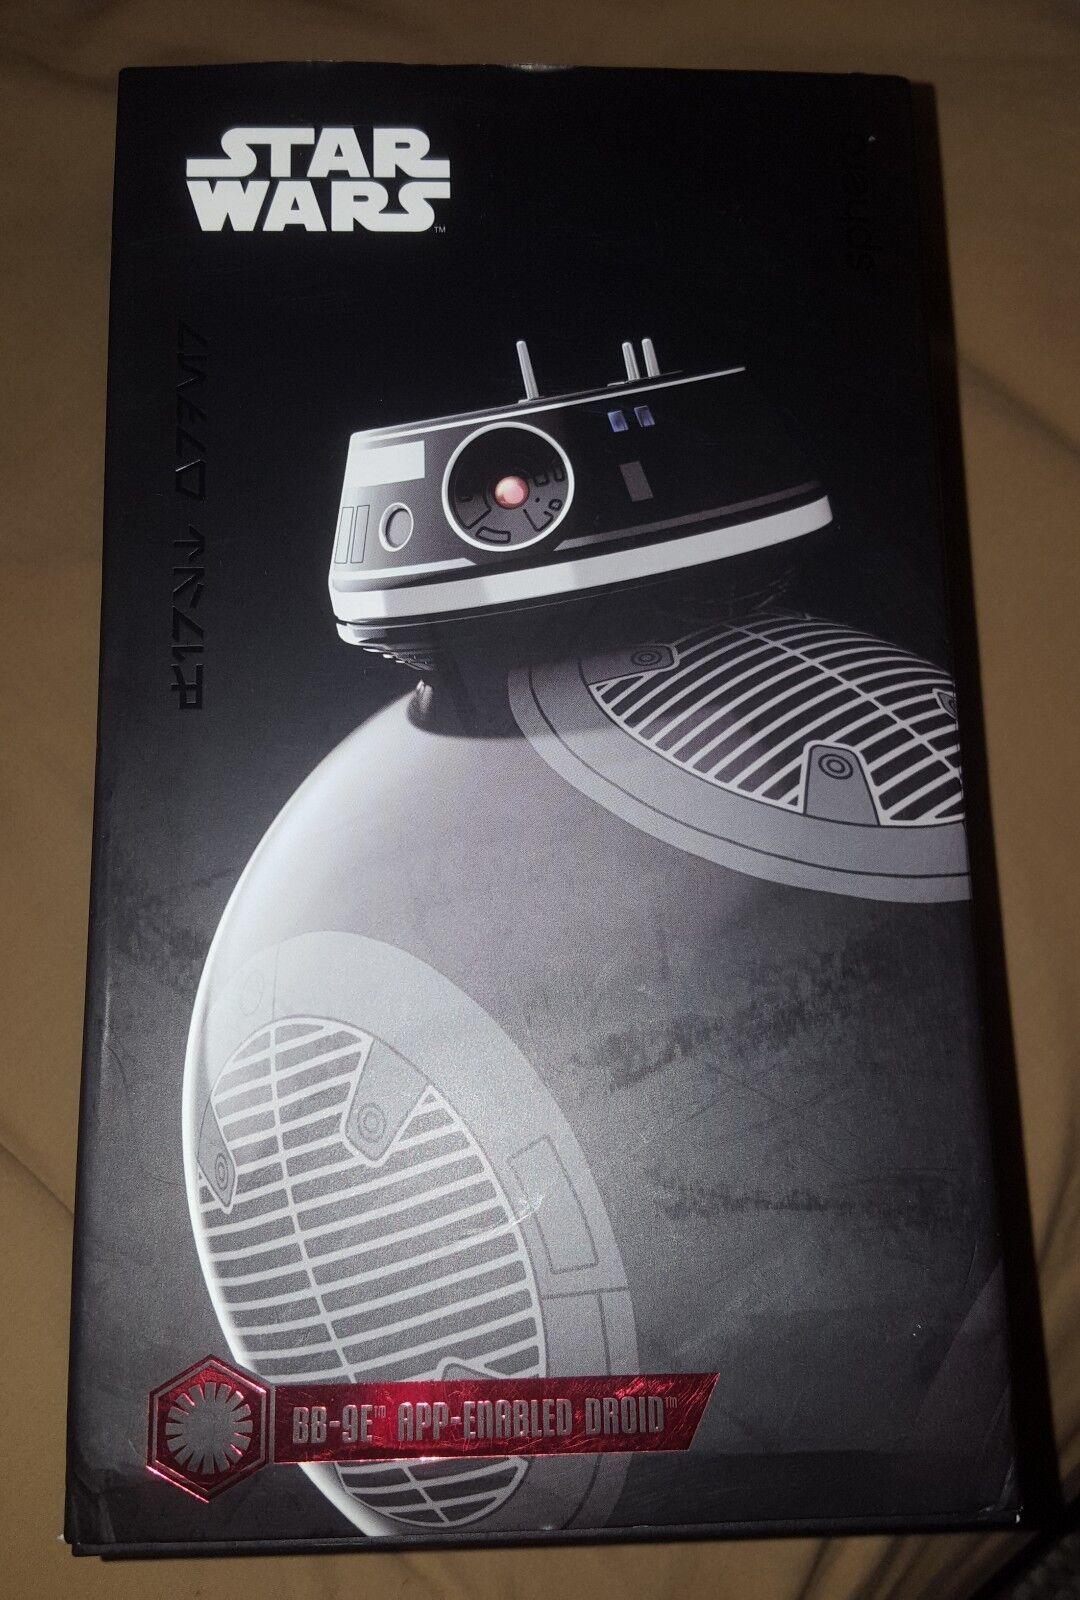 Sphero Star Wars The Last Jedi BB-9E App Enabled Droid VD01